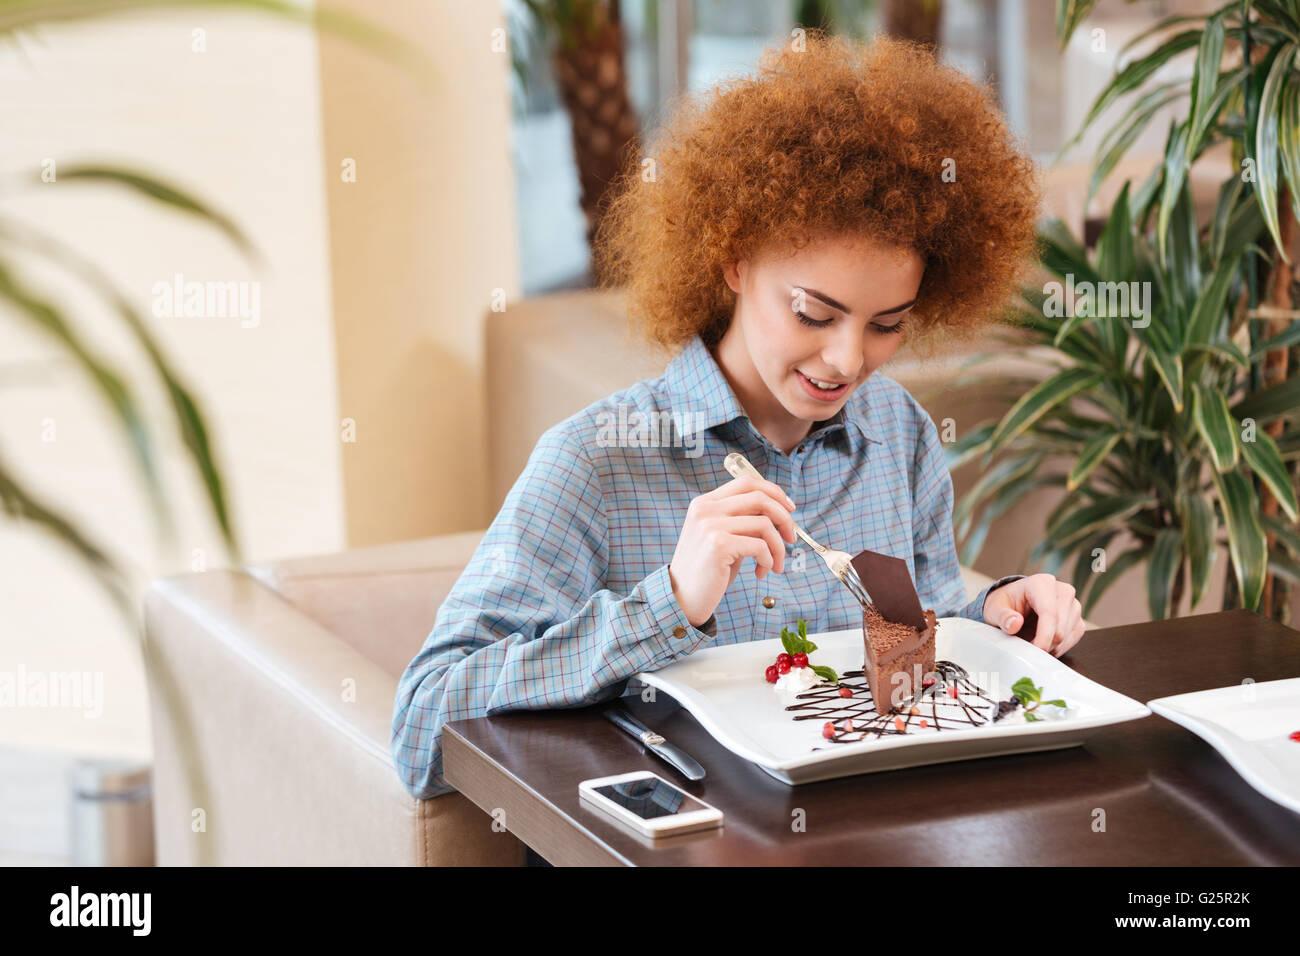 Cute rizado mujer joven con cabello rojo comer postre en cafe Imagen De Stock